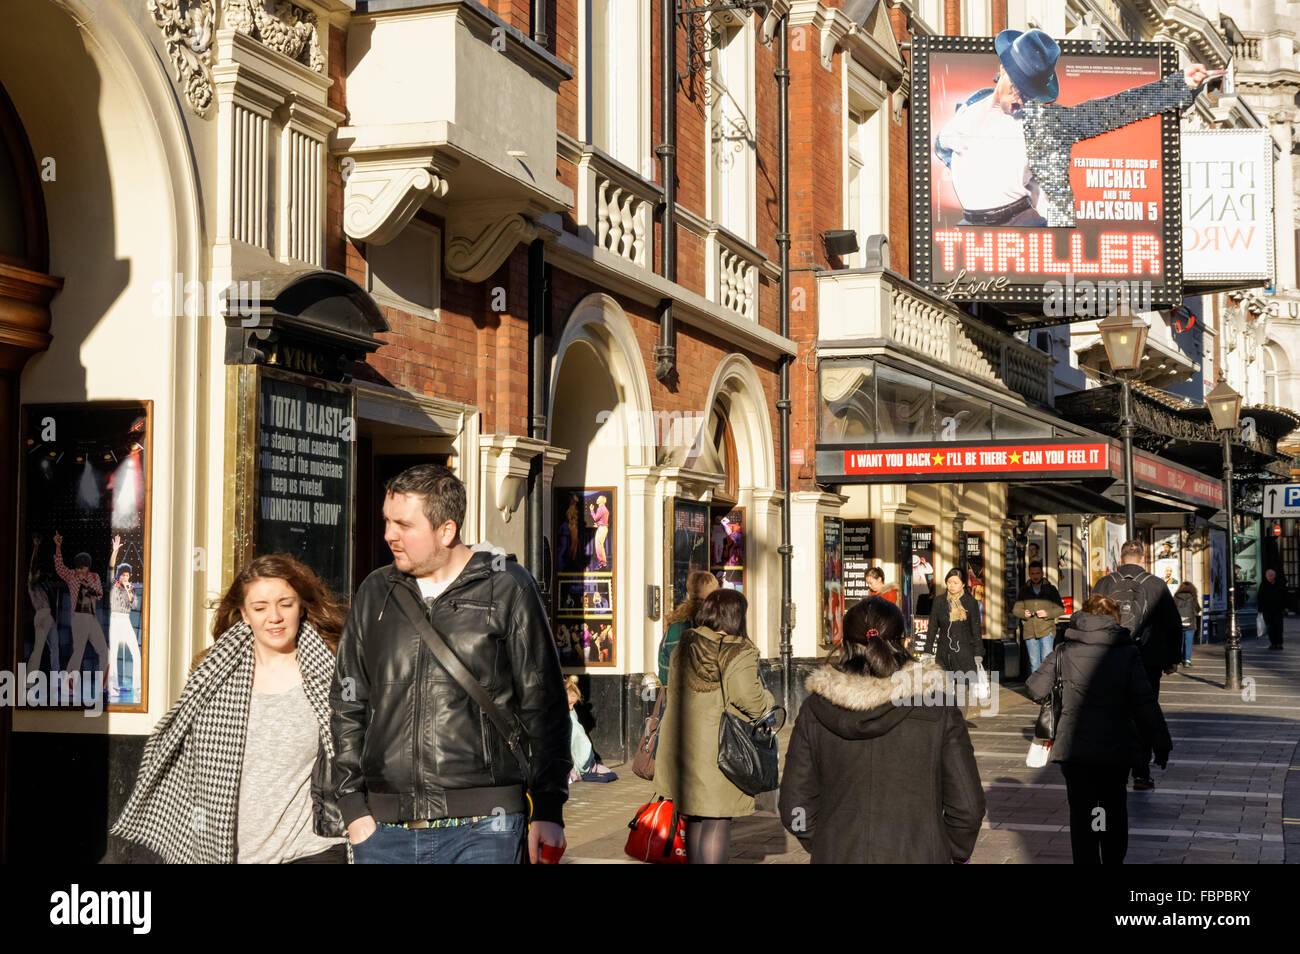 The Lyric Theatre at West End on Shaftesbury Avenue, London England United Kingdom UK - Stock Image